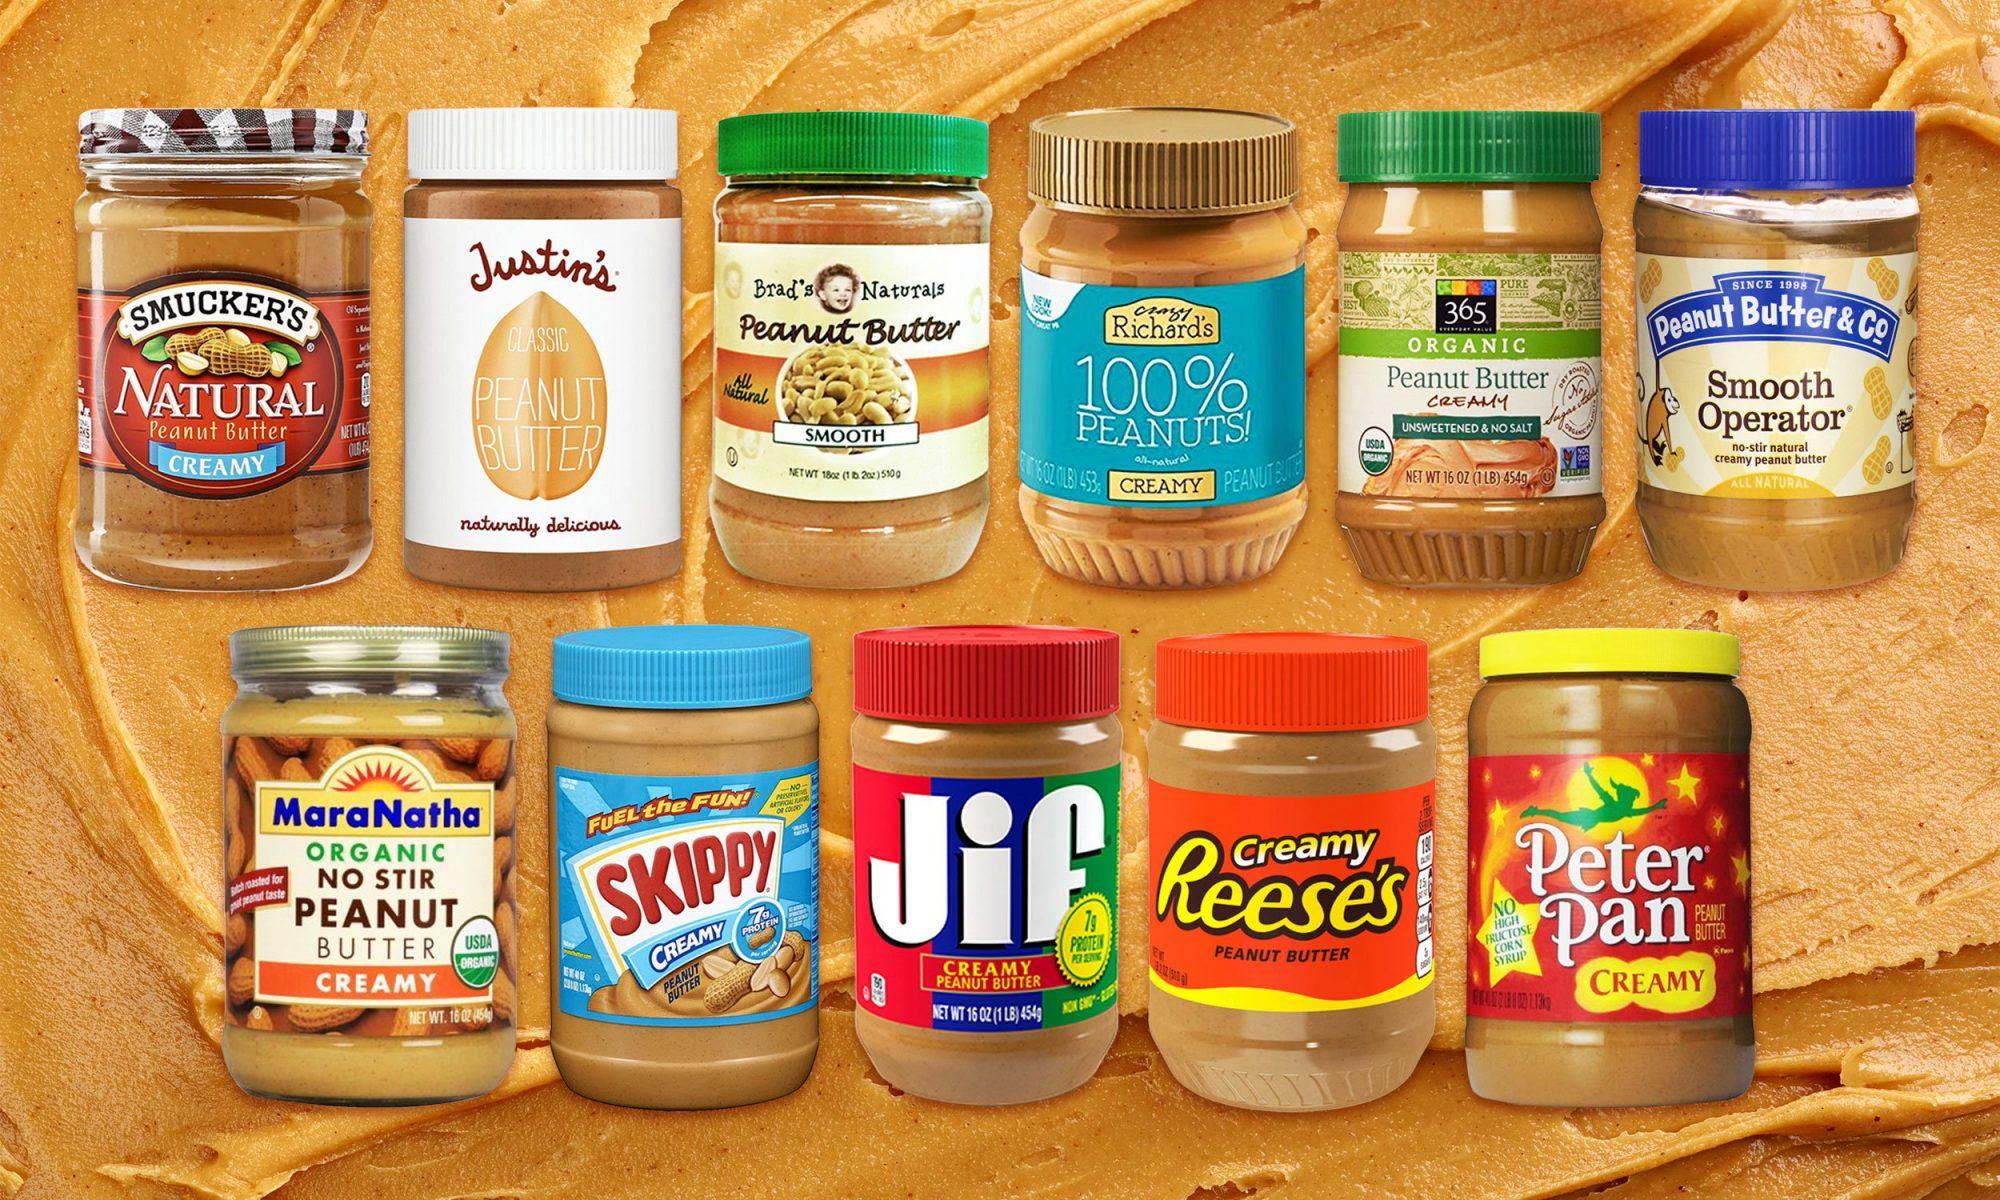 Peanut Butter taste test